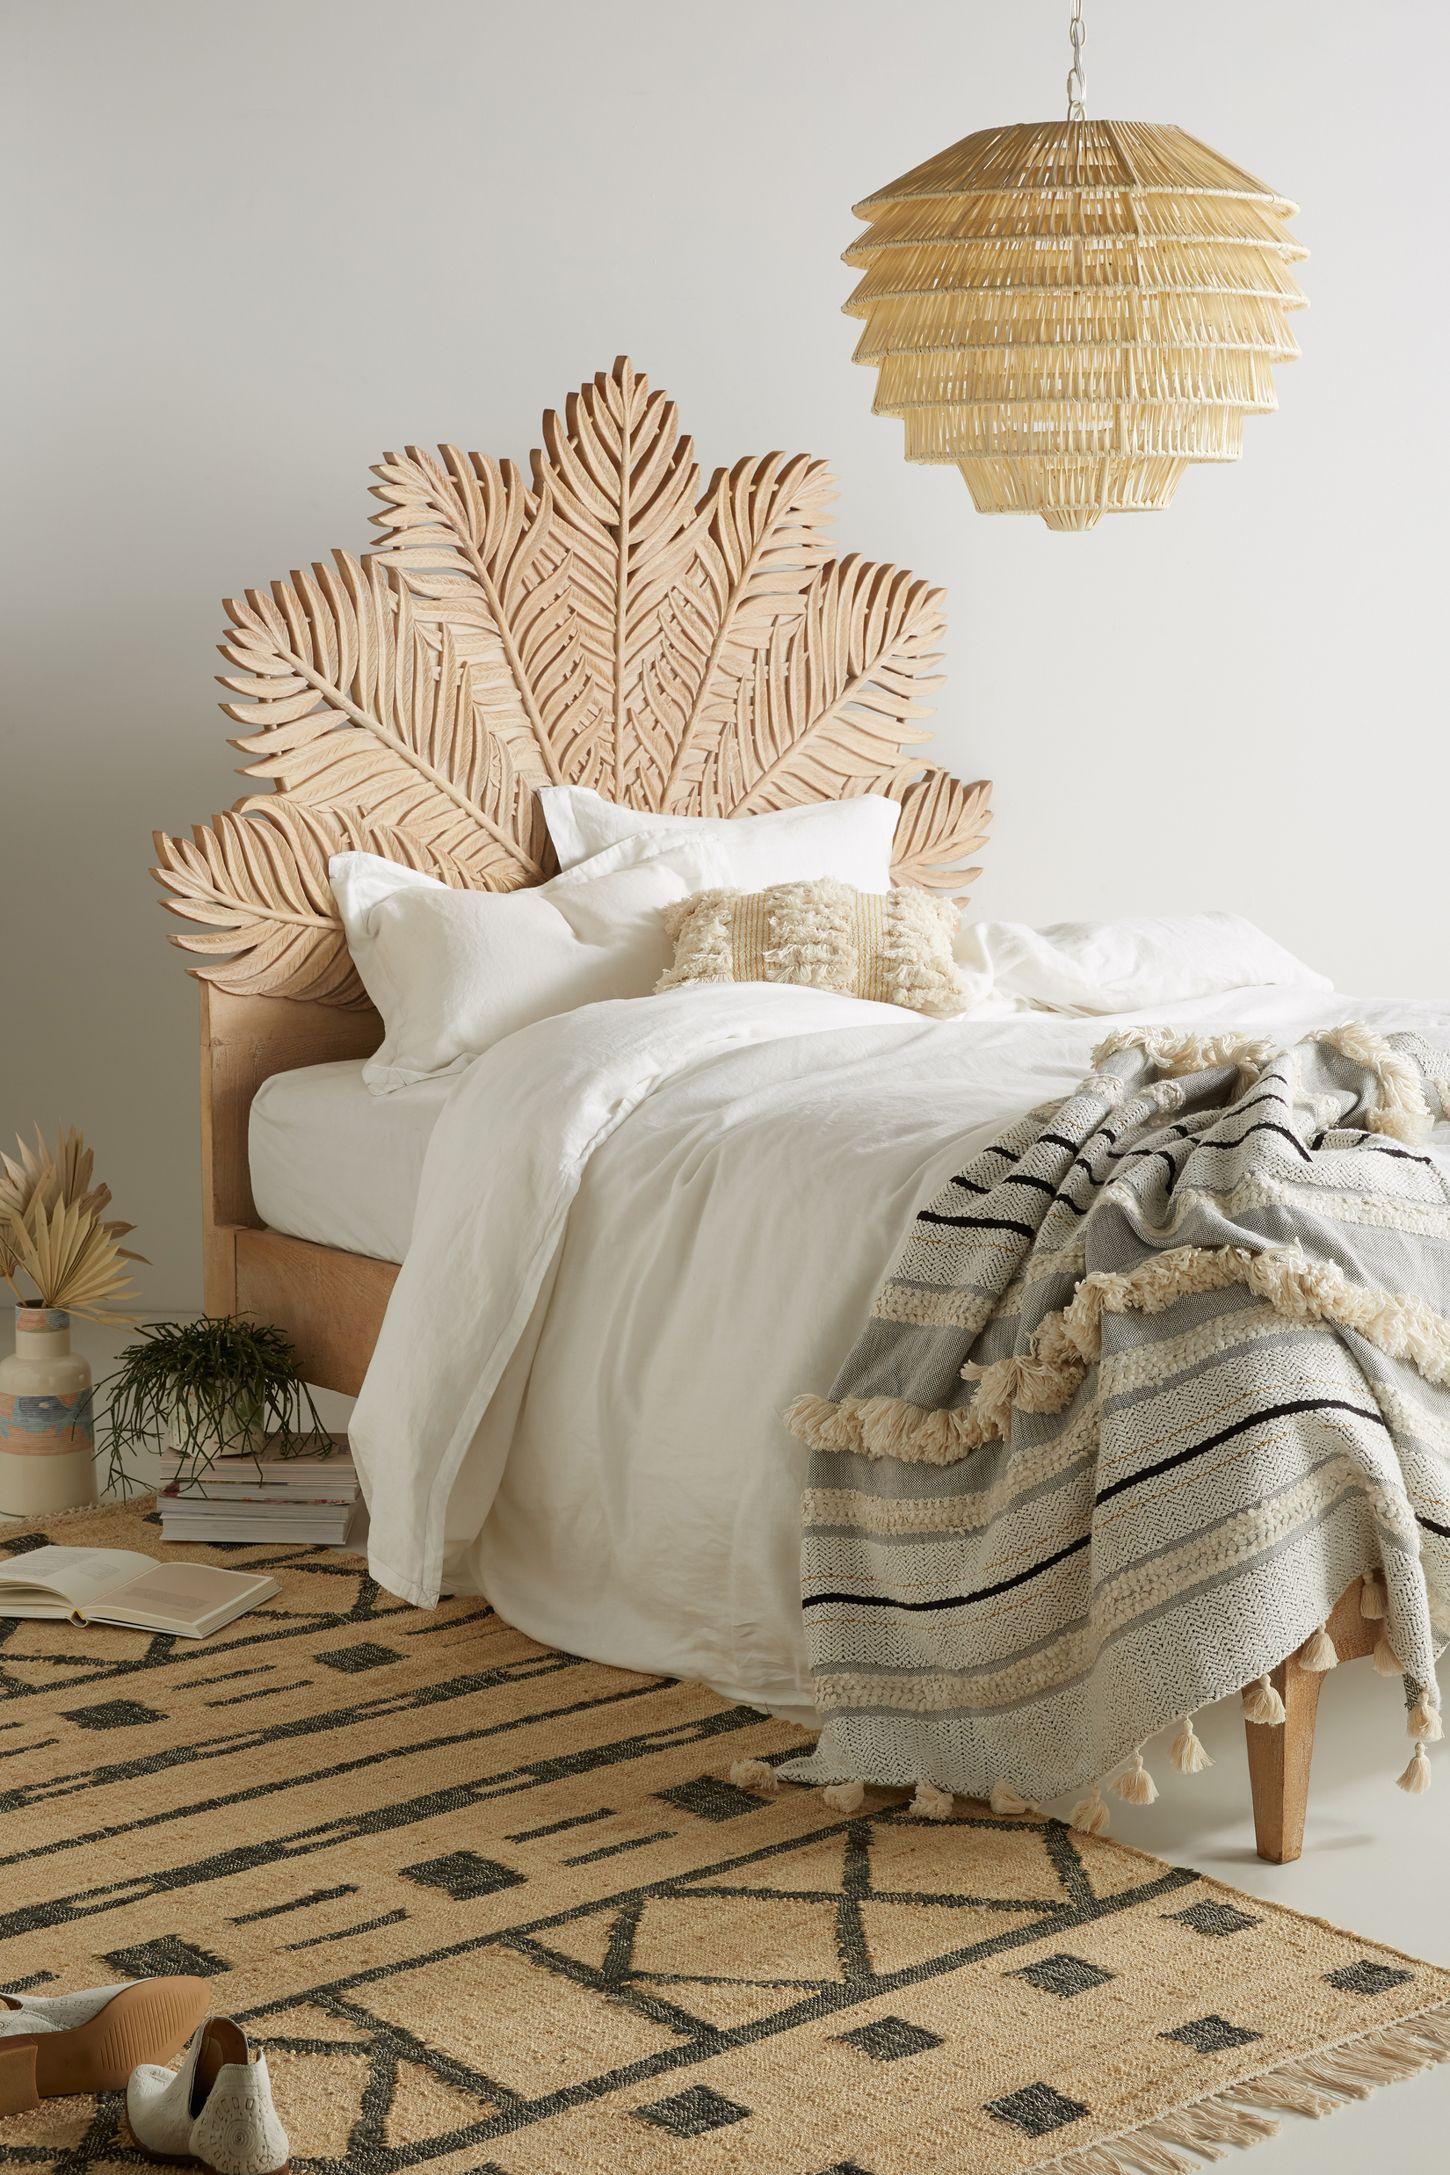 Unique Bedroom Furniture & Sets